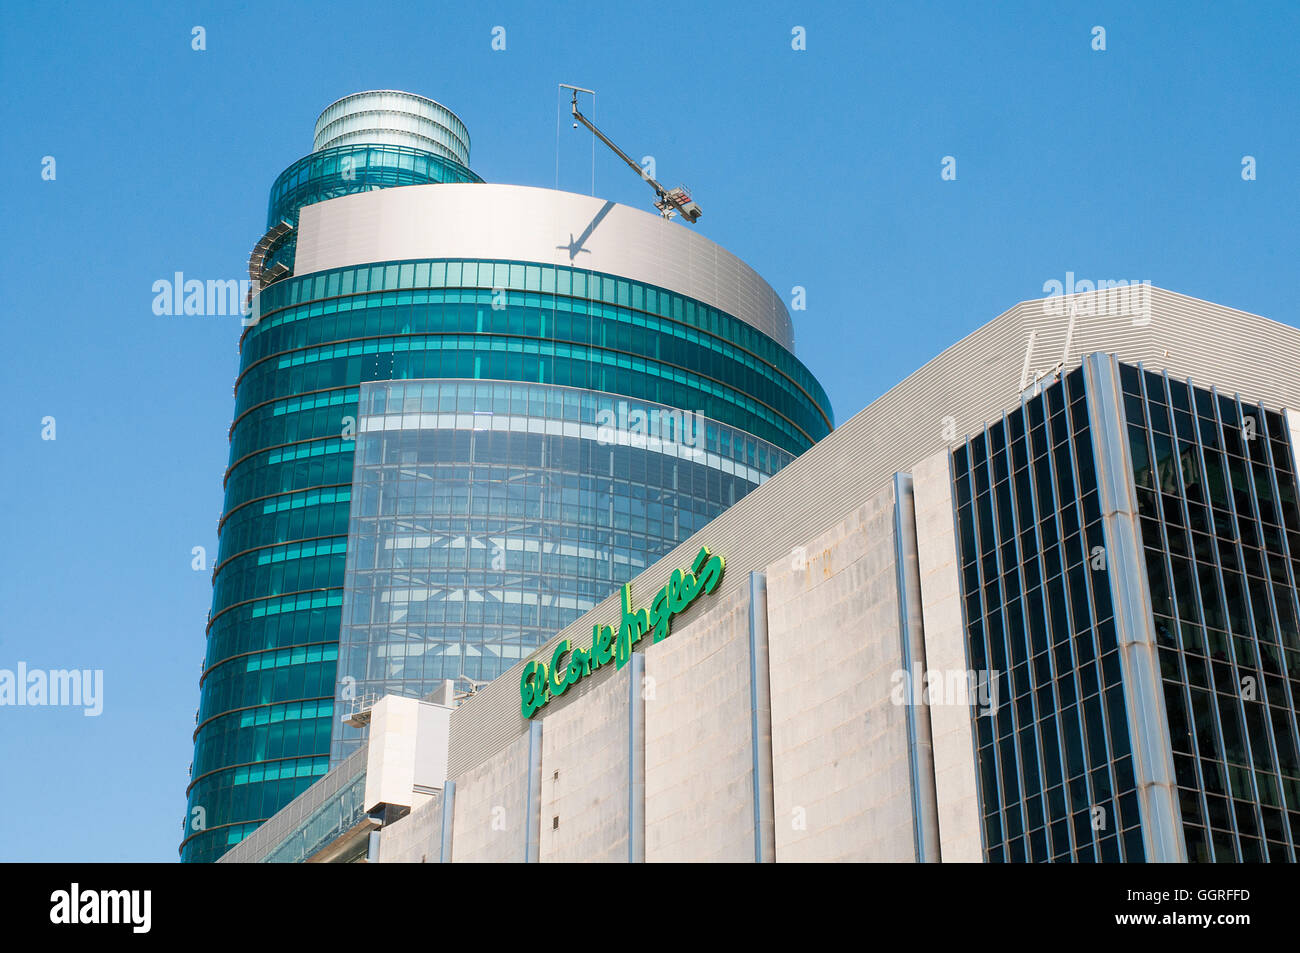 Titania-Turm und El Corte Ingles Gebäude. AZCA, Madrid, Spanien. Stockbild